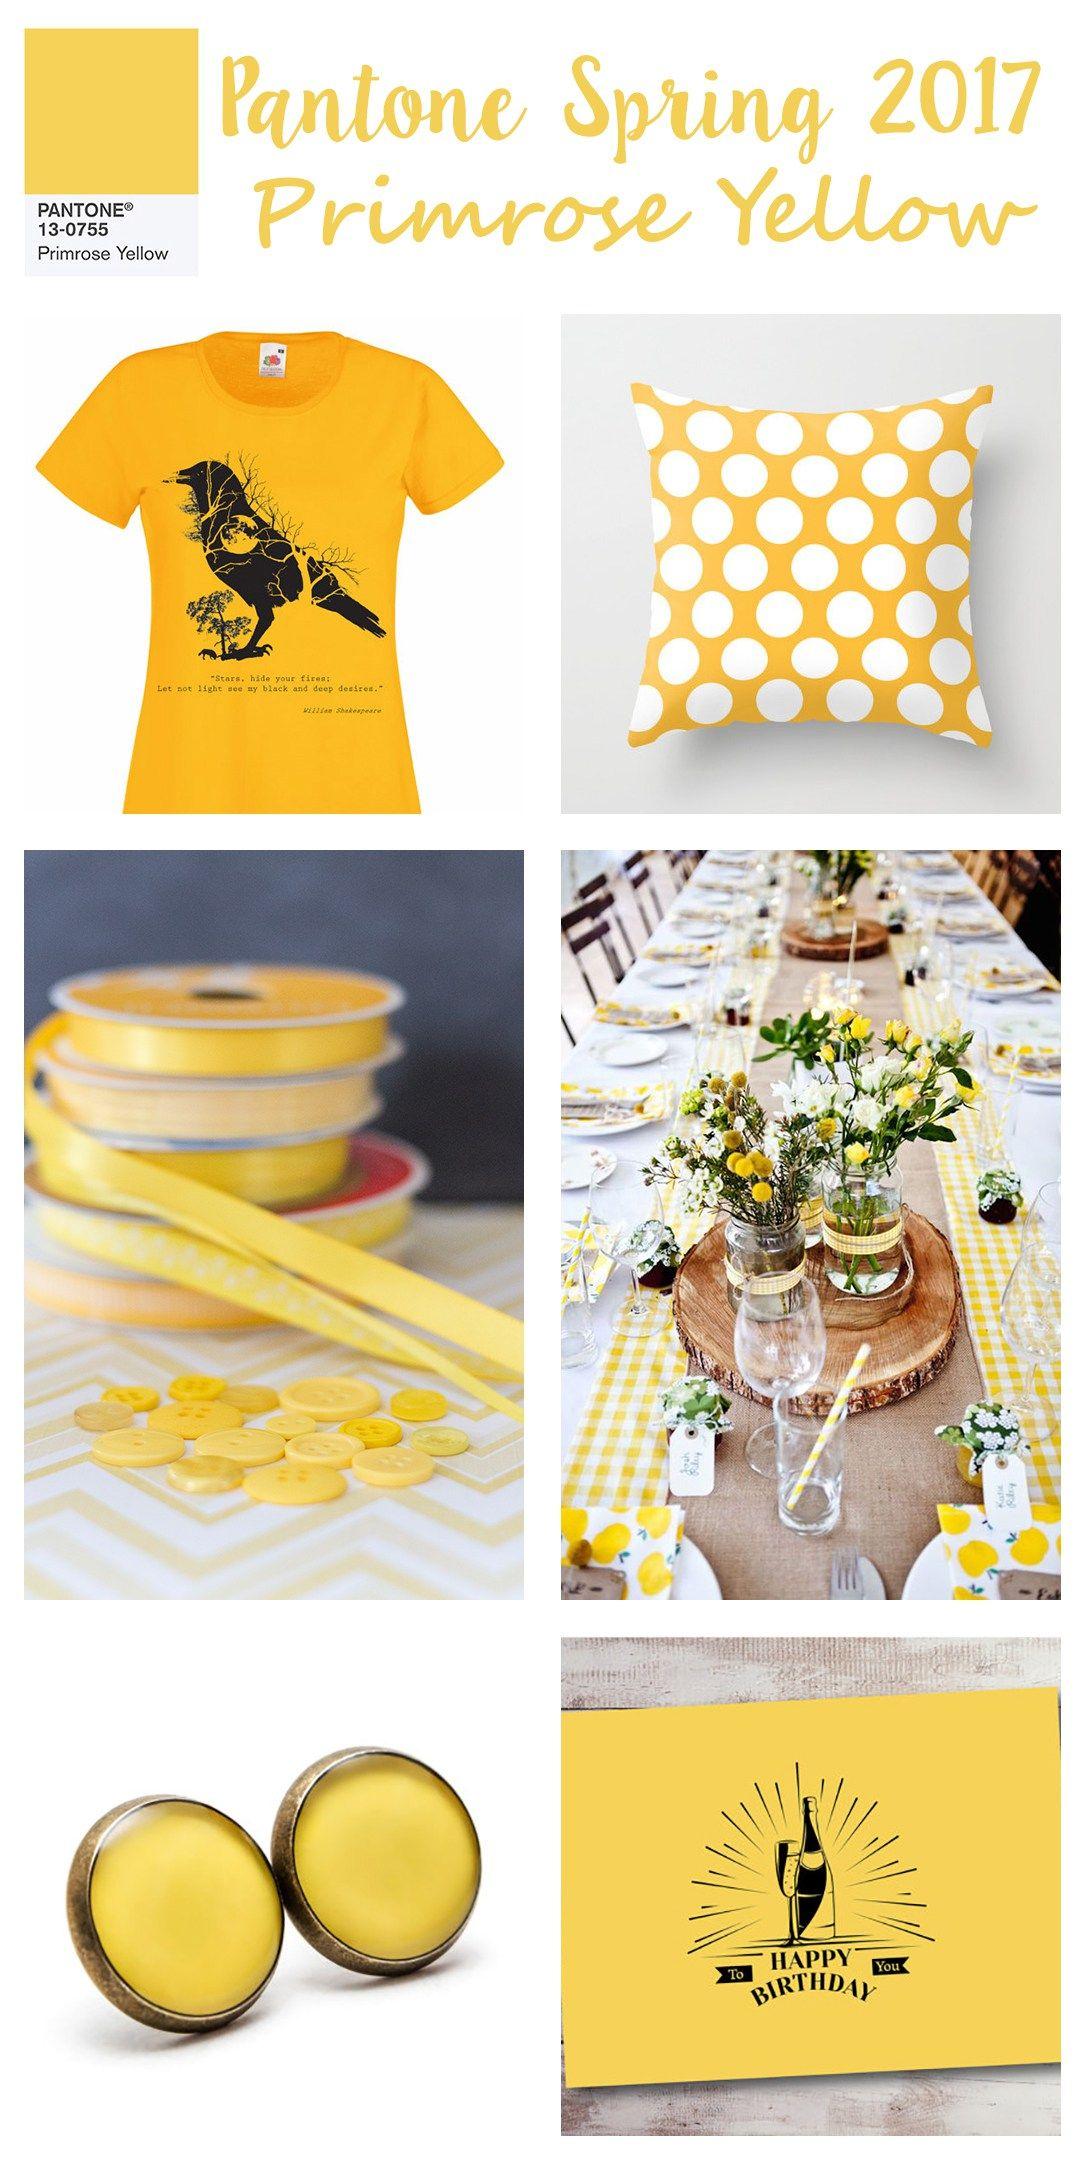 Pantone Spring 2017 Primrose Yellow - Httpwwwroseclearfieldcom